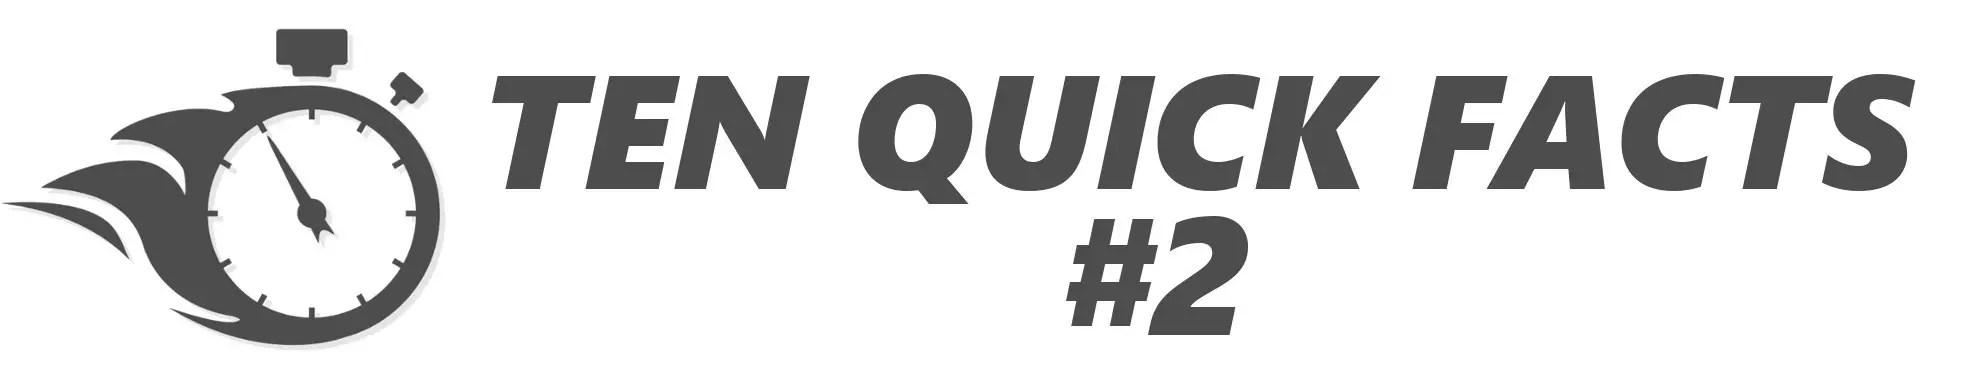 Ten Quick Facts #2